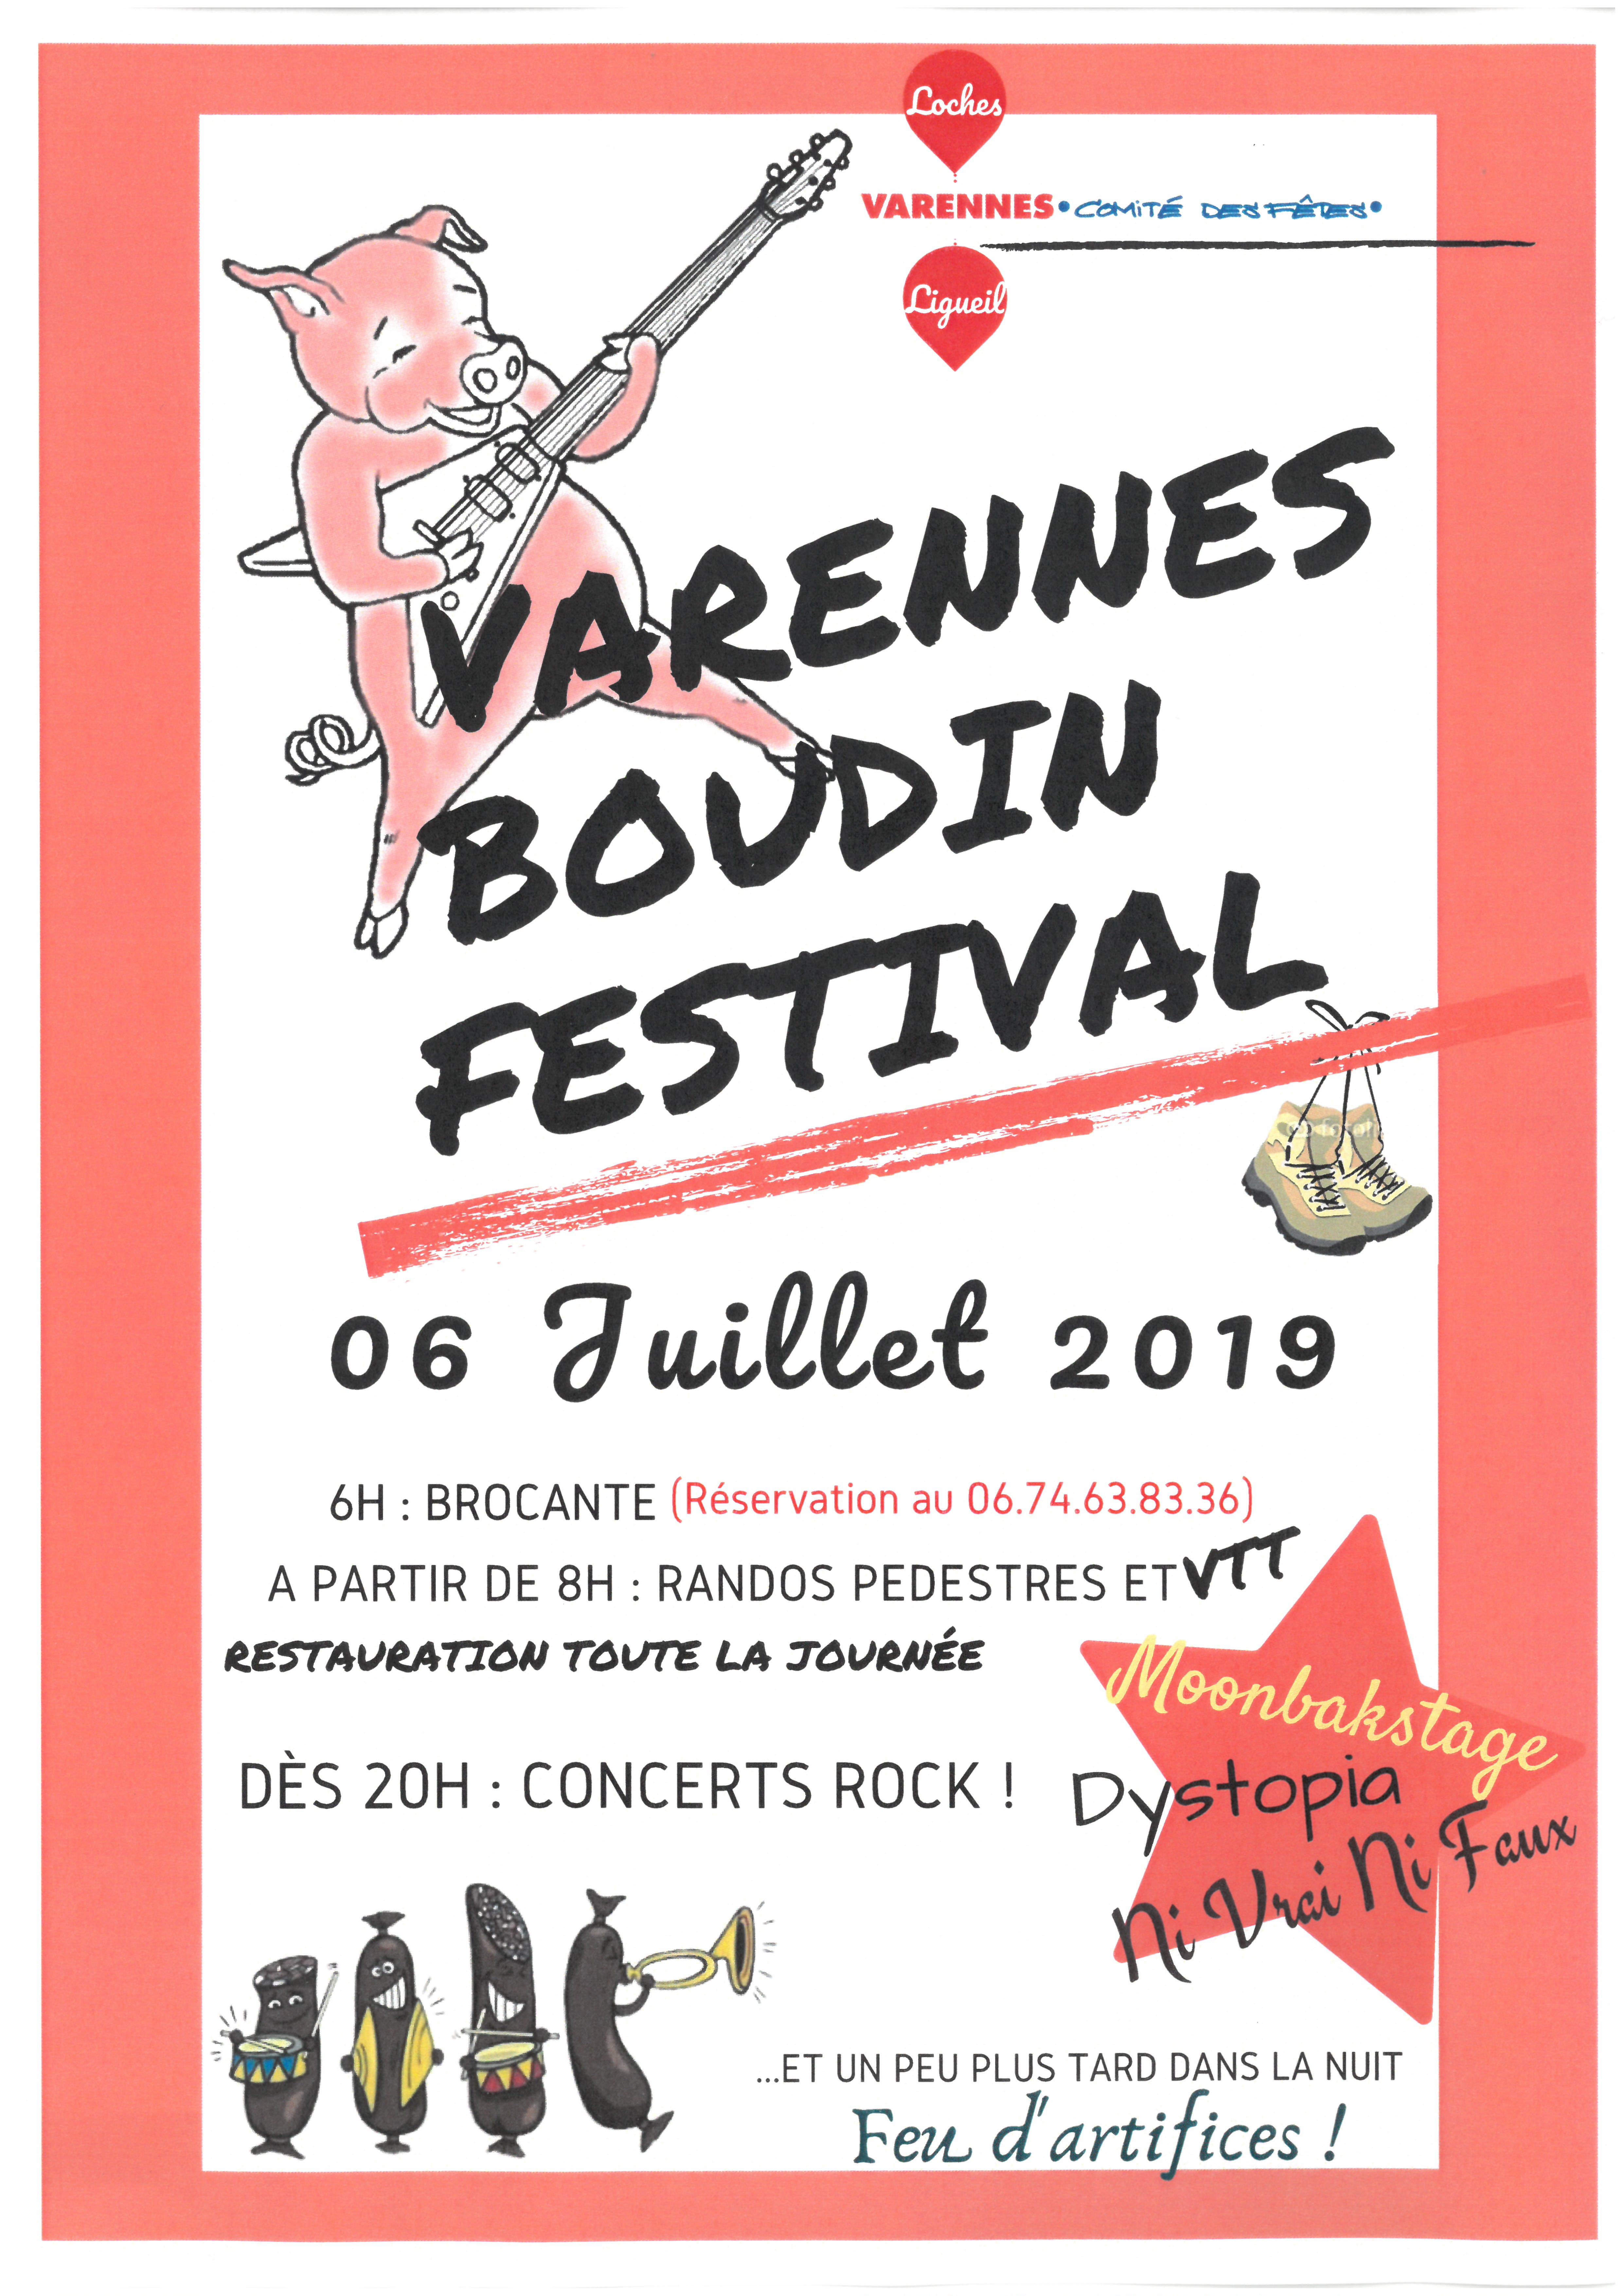 CDF VARENNES - Varennes Boudin Festival 6 juillet 2019.jpg